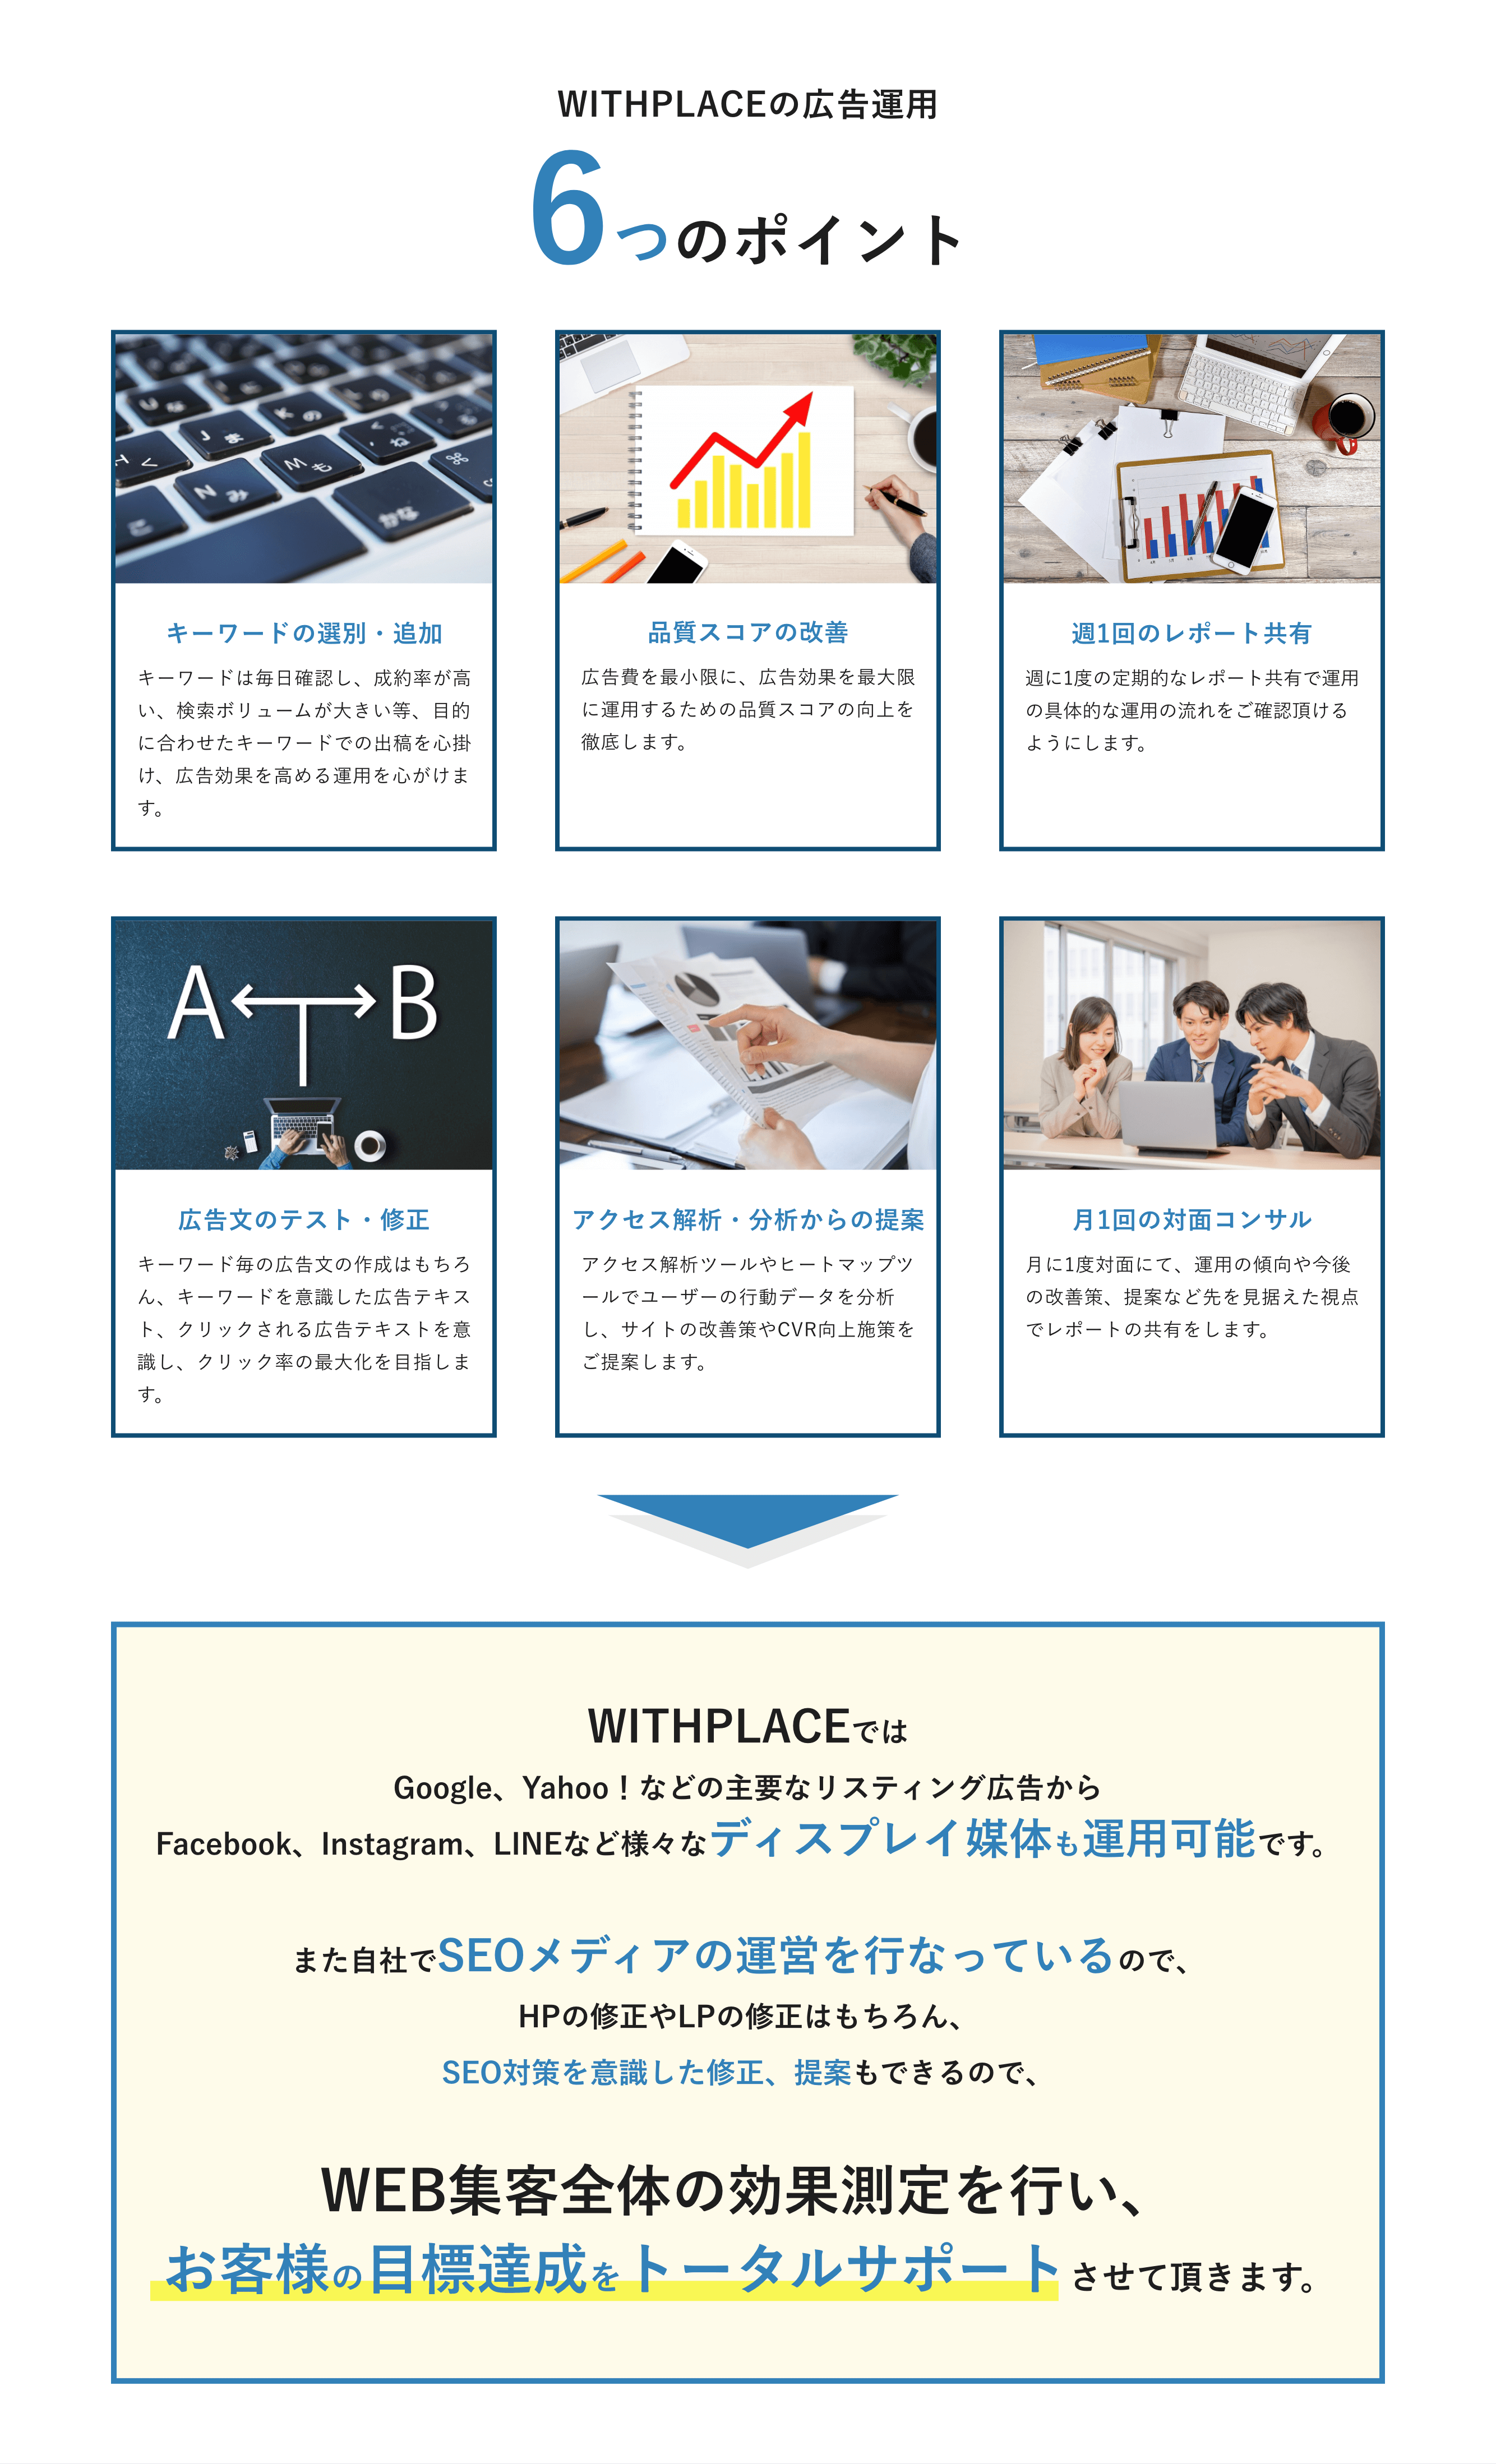 WITHPLACEの広告運用6つのポイント